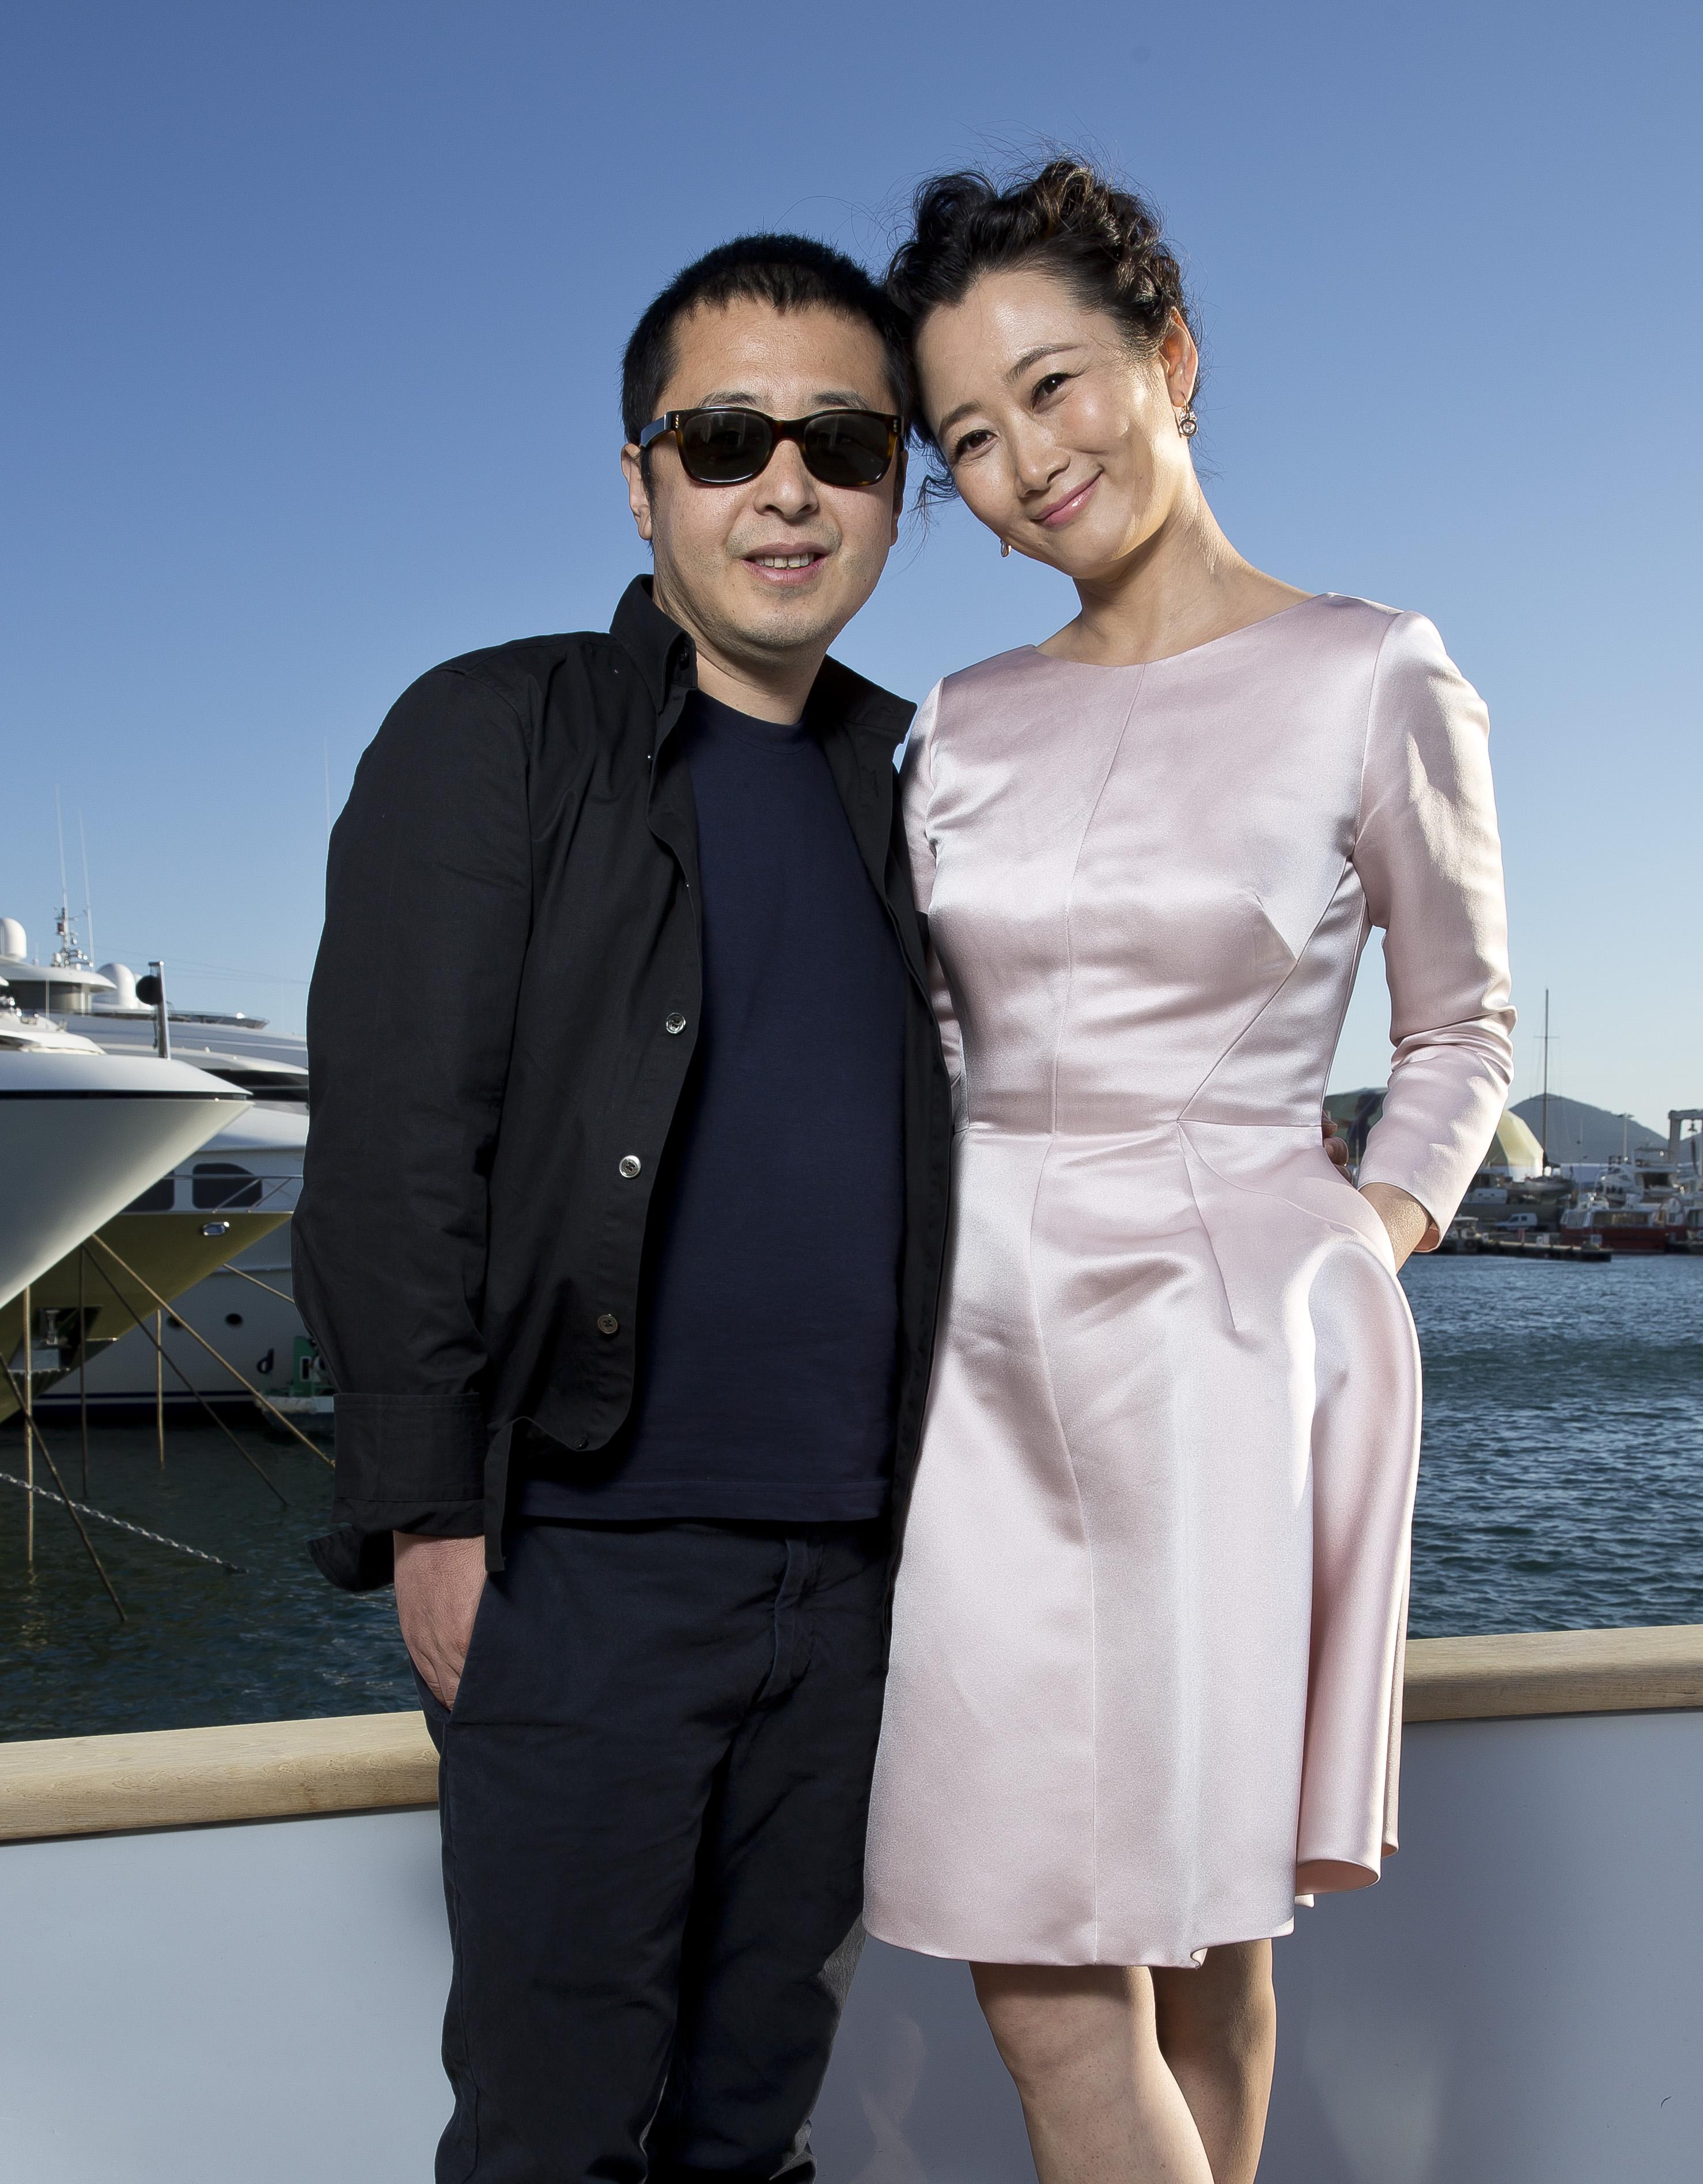 Jia Zhangke et Zhao Tao par Paul Blind, Cannes 2015